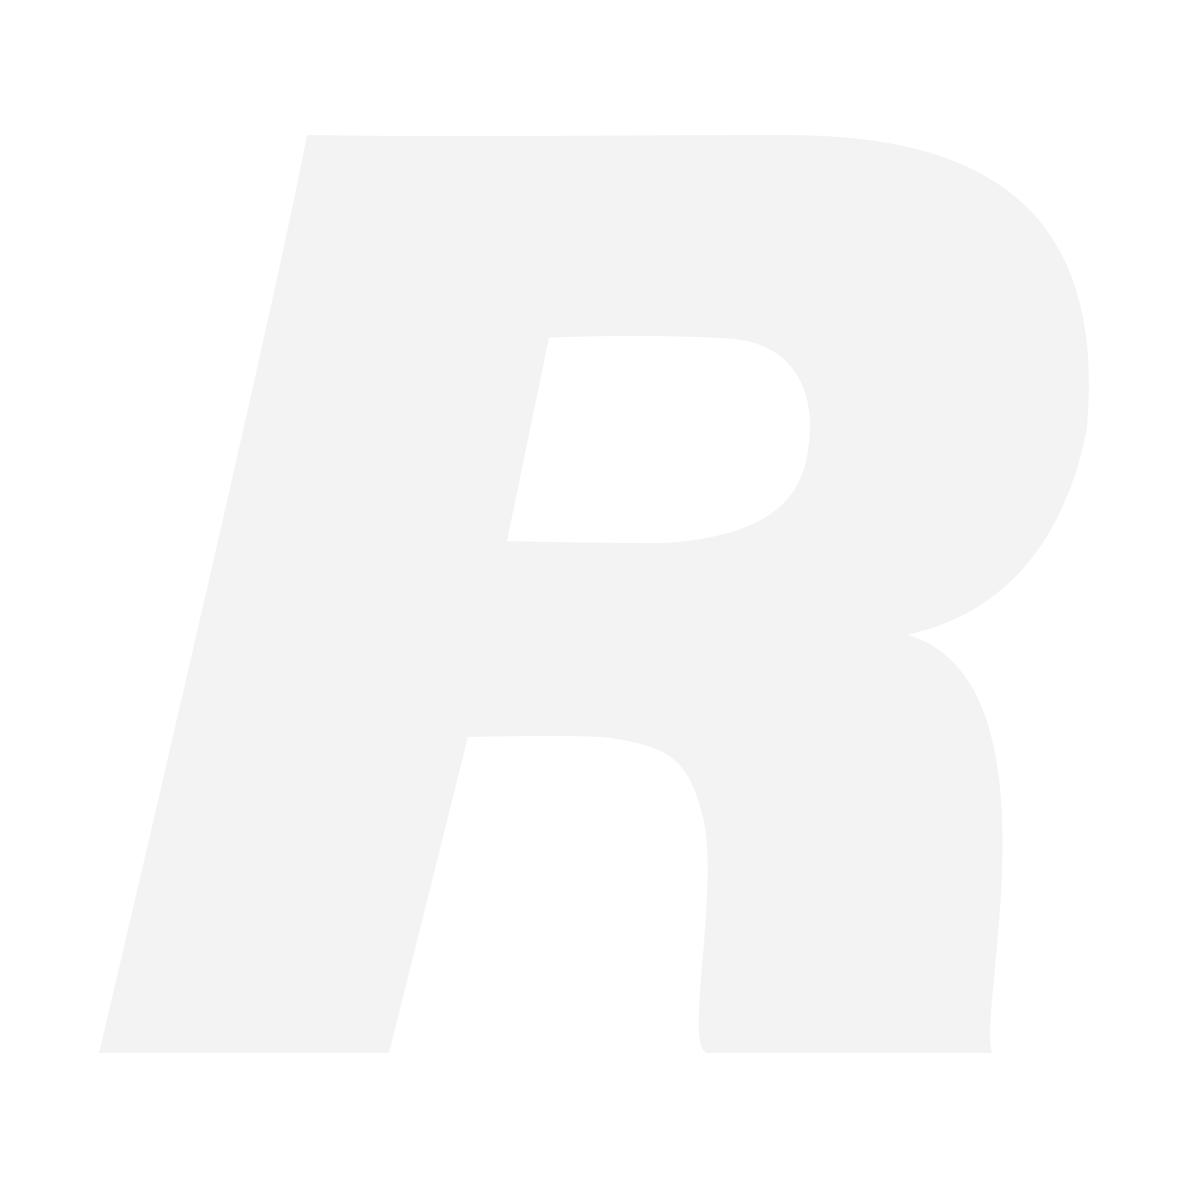 Gitzo L-Bracket GSLBRSY (Sony A7R III, A9)